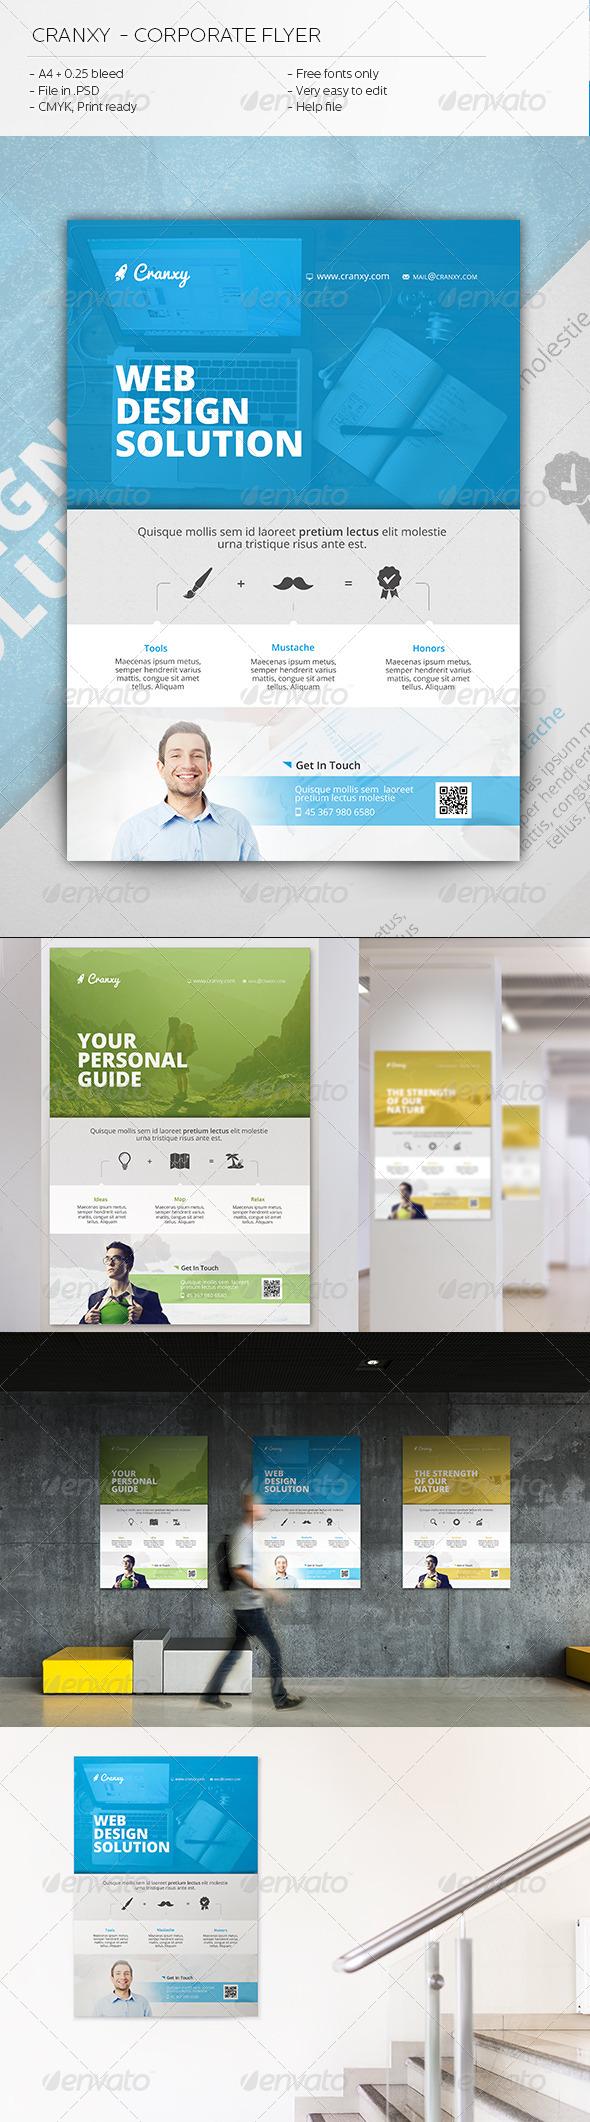 GraphicRiver Cranxy Corporate Flyer 6313088